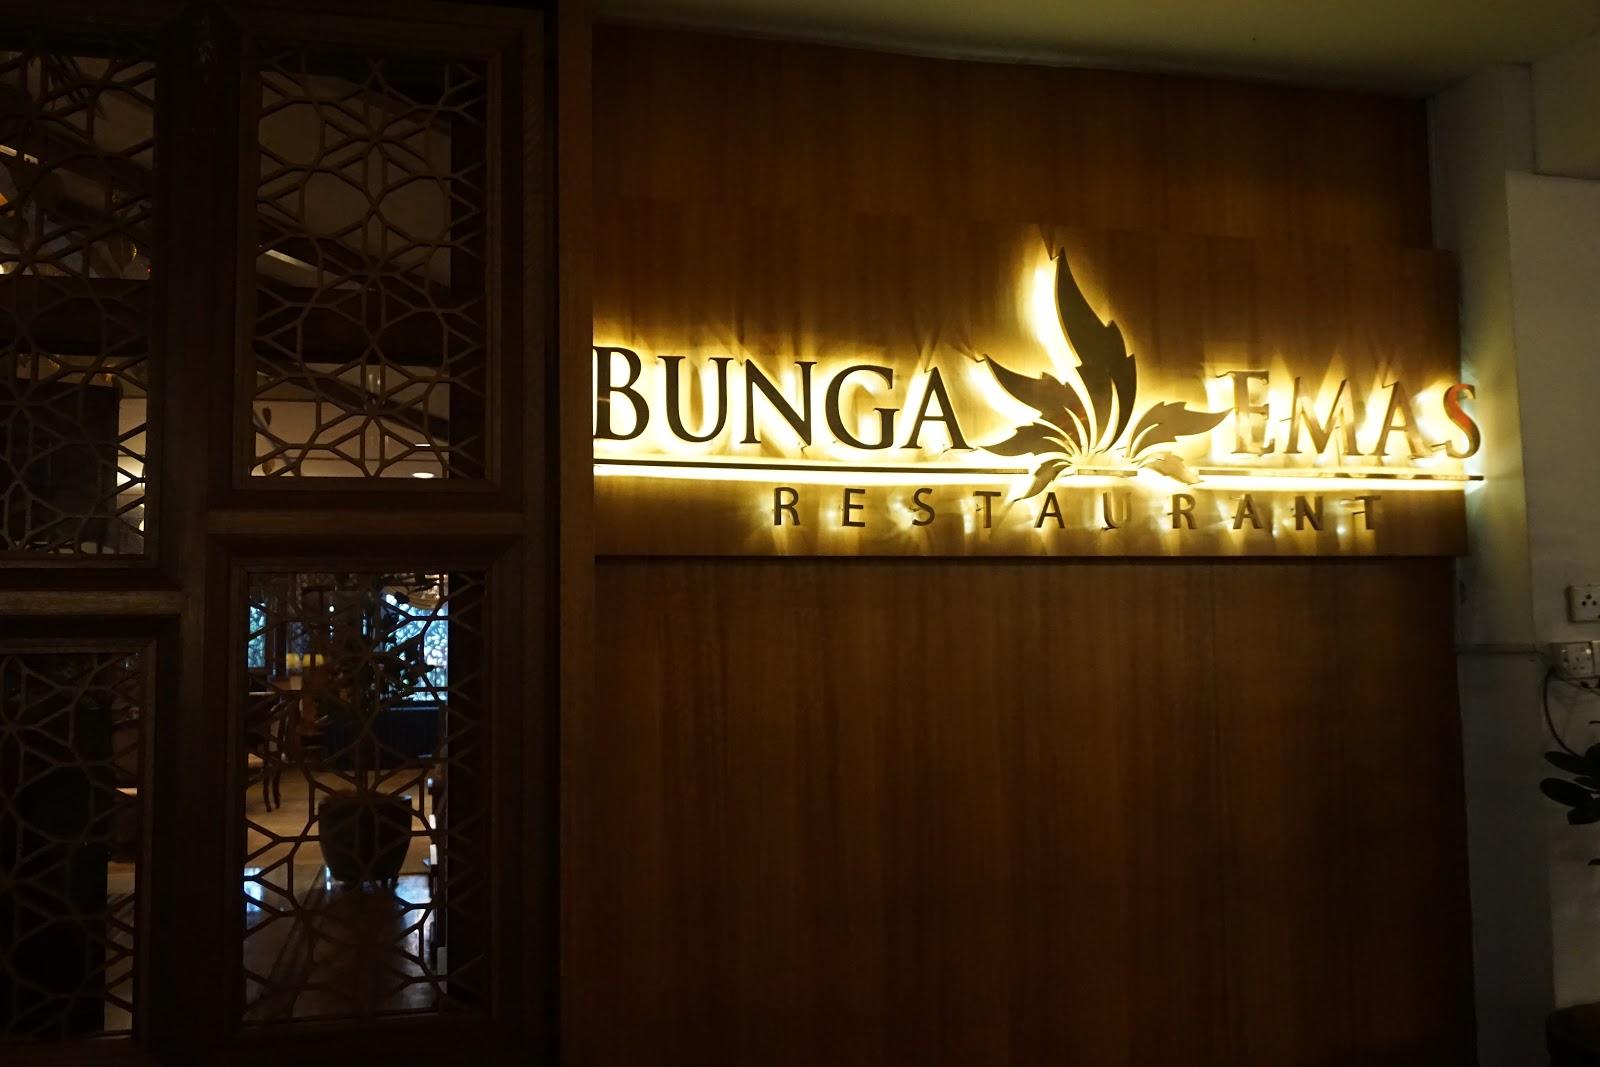 ROYALE CHULAN KL, ROYALE CHULAN KUALA LUMPUR, ROYALE CHULAN, HOTEL HUNTING, FOOD, restaurant, BUNGA EMAS RESTAURANT,